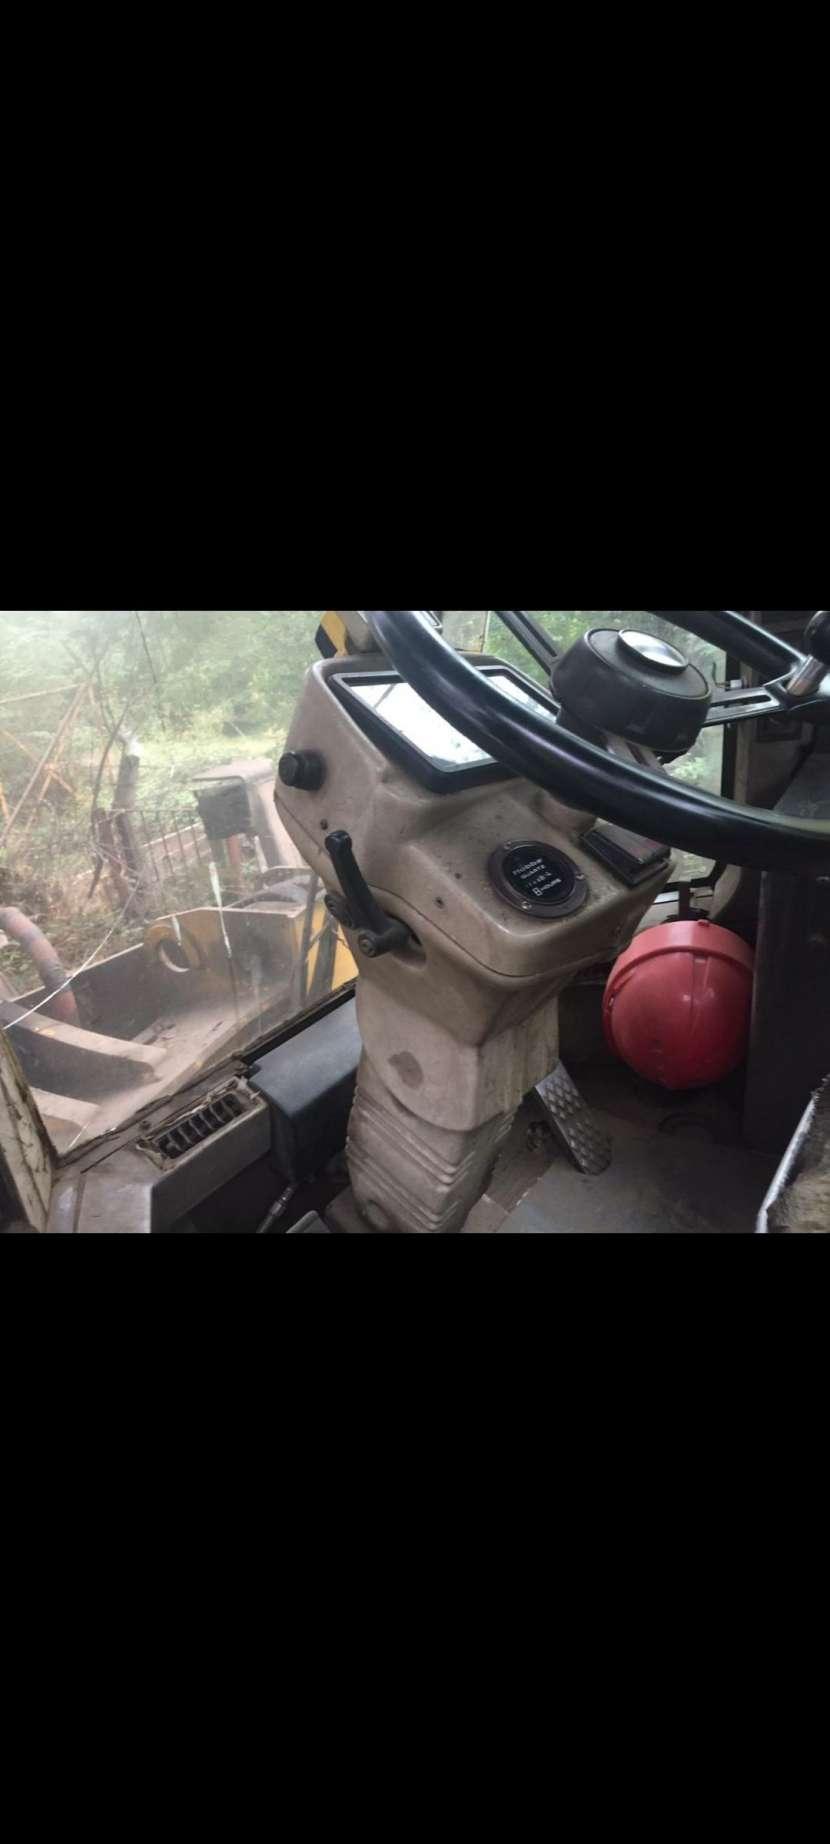 Pala cargadora New Holland W130 - 6